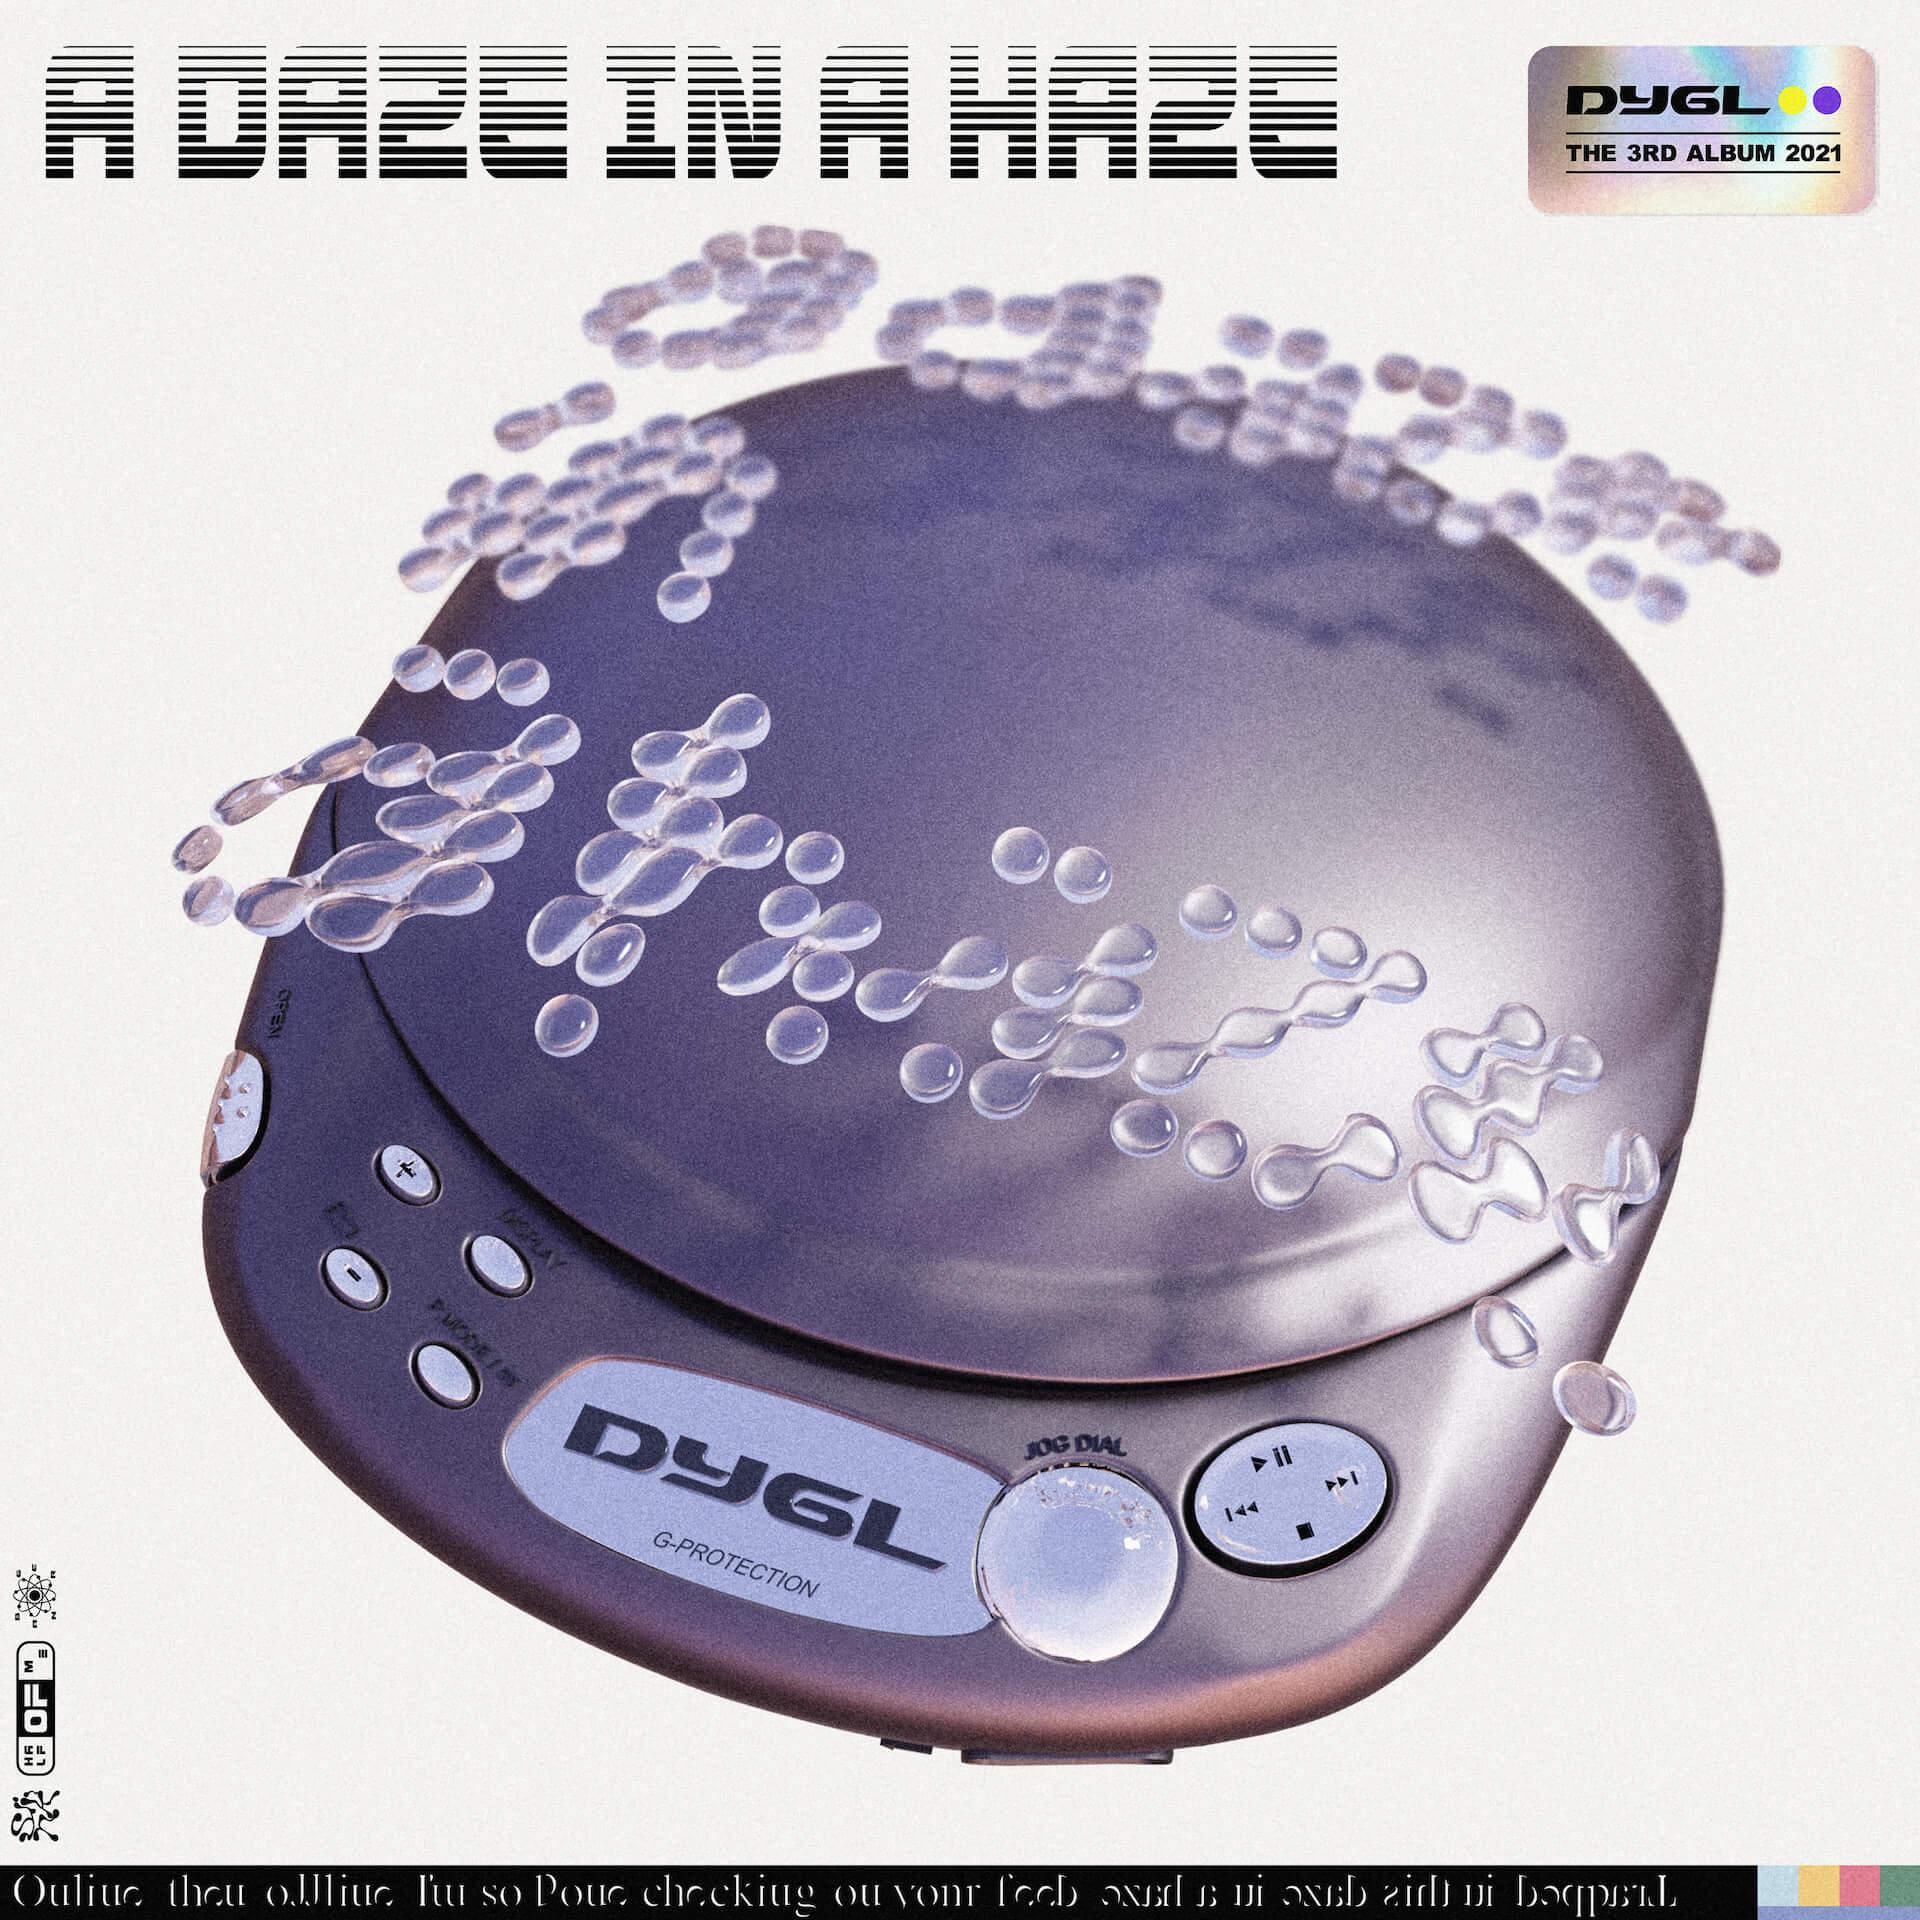 DYGLによる3rdアルバム『A Daze In A Haze』のトラックリストが解禁!限定盤パッケージも公開 music210526_dygl_2